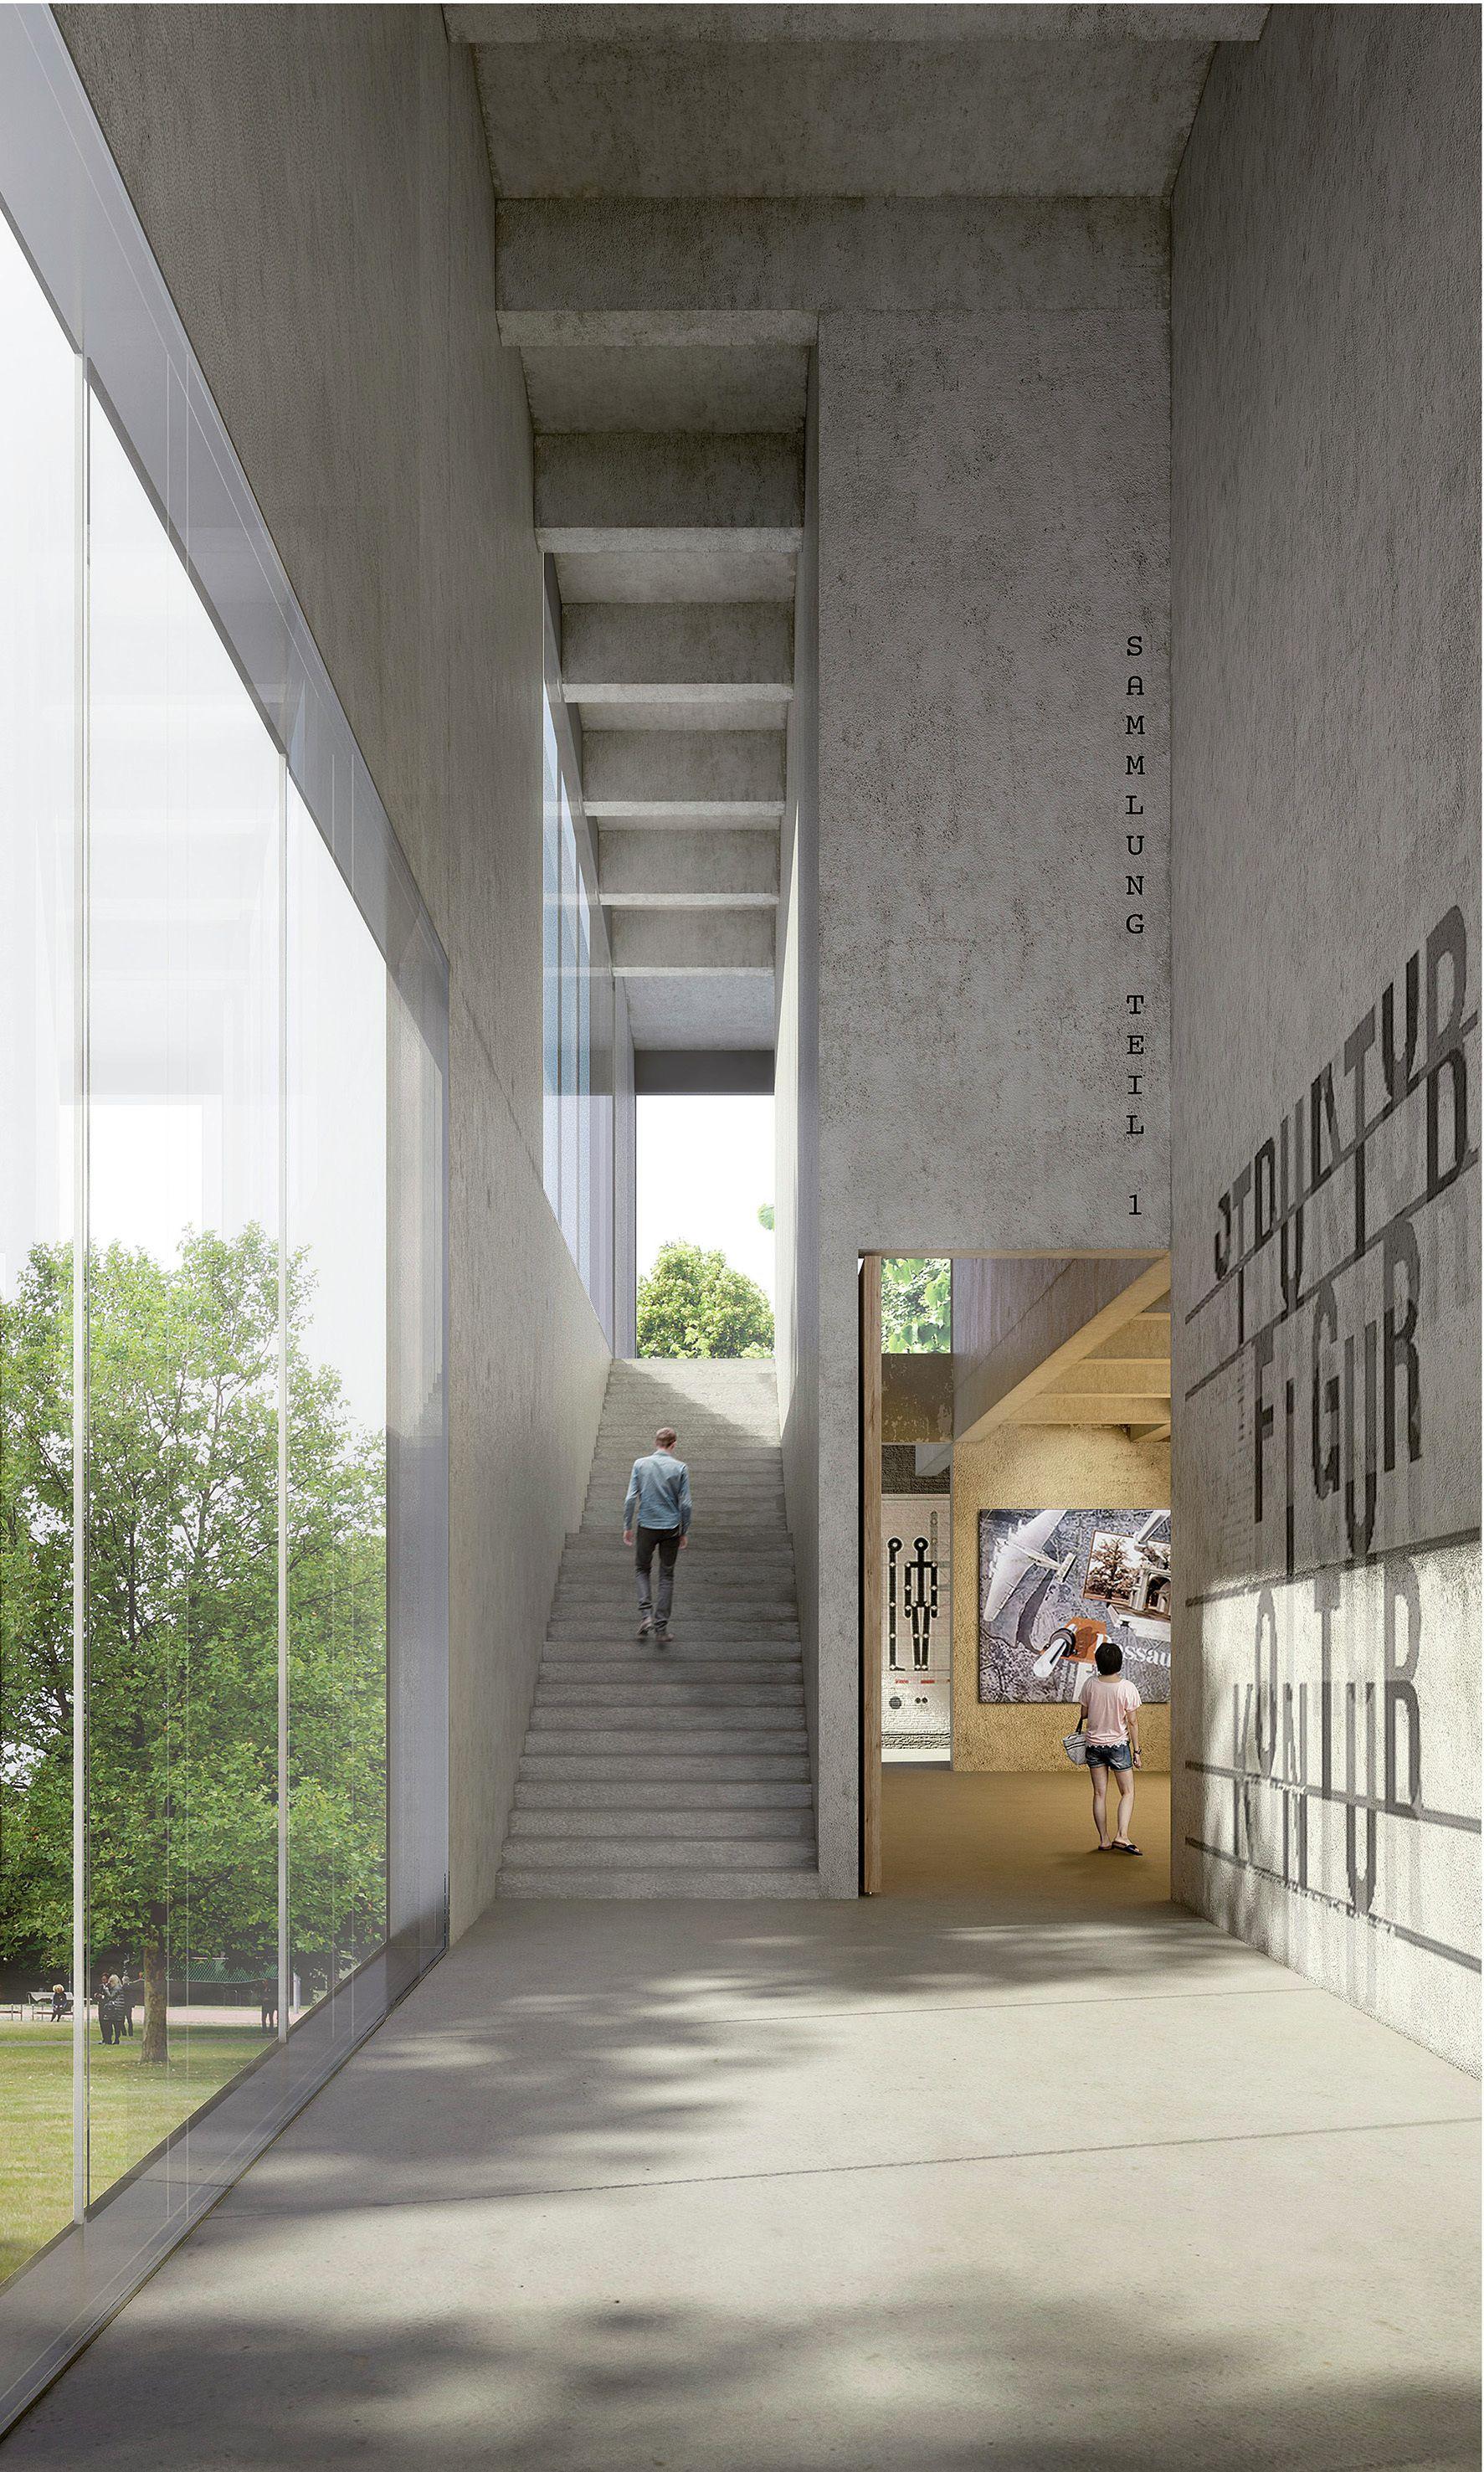 Gallery of Foundation Bauhaus Dessau Announces Winners of